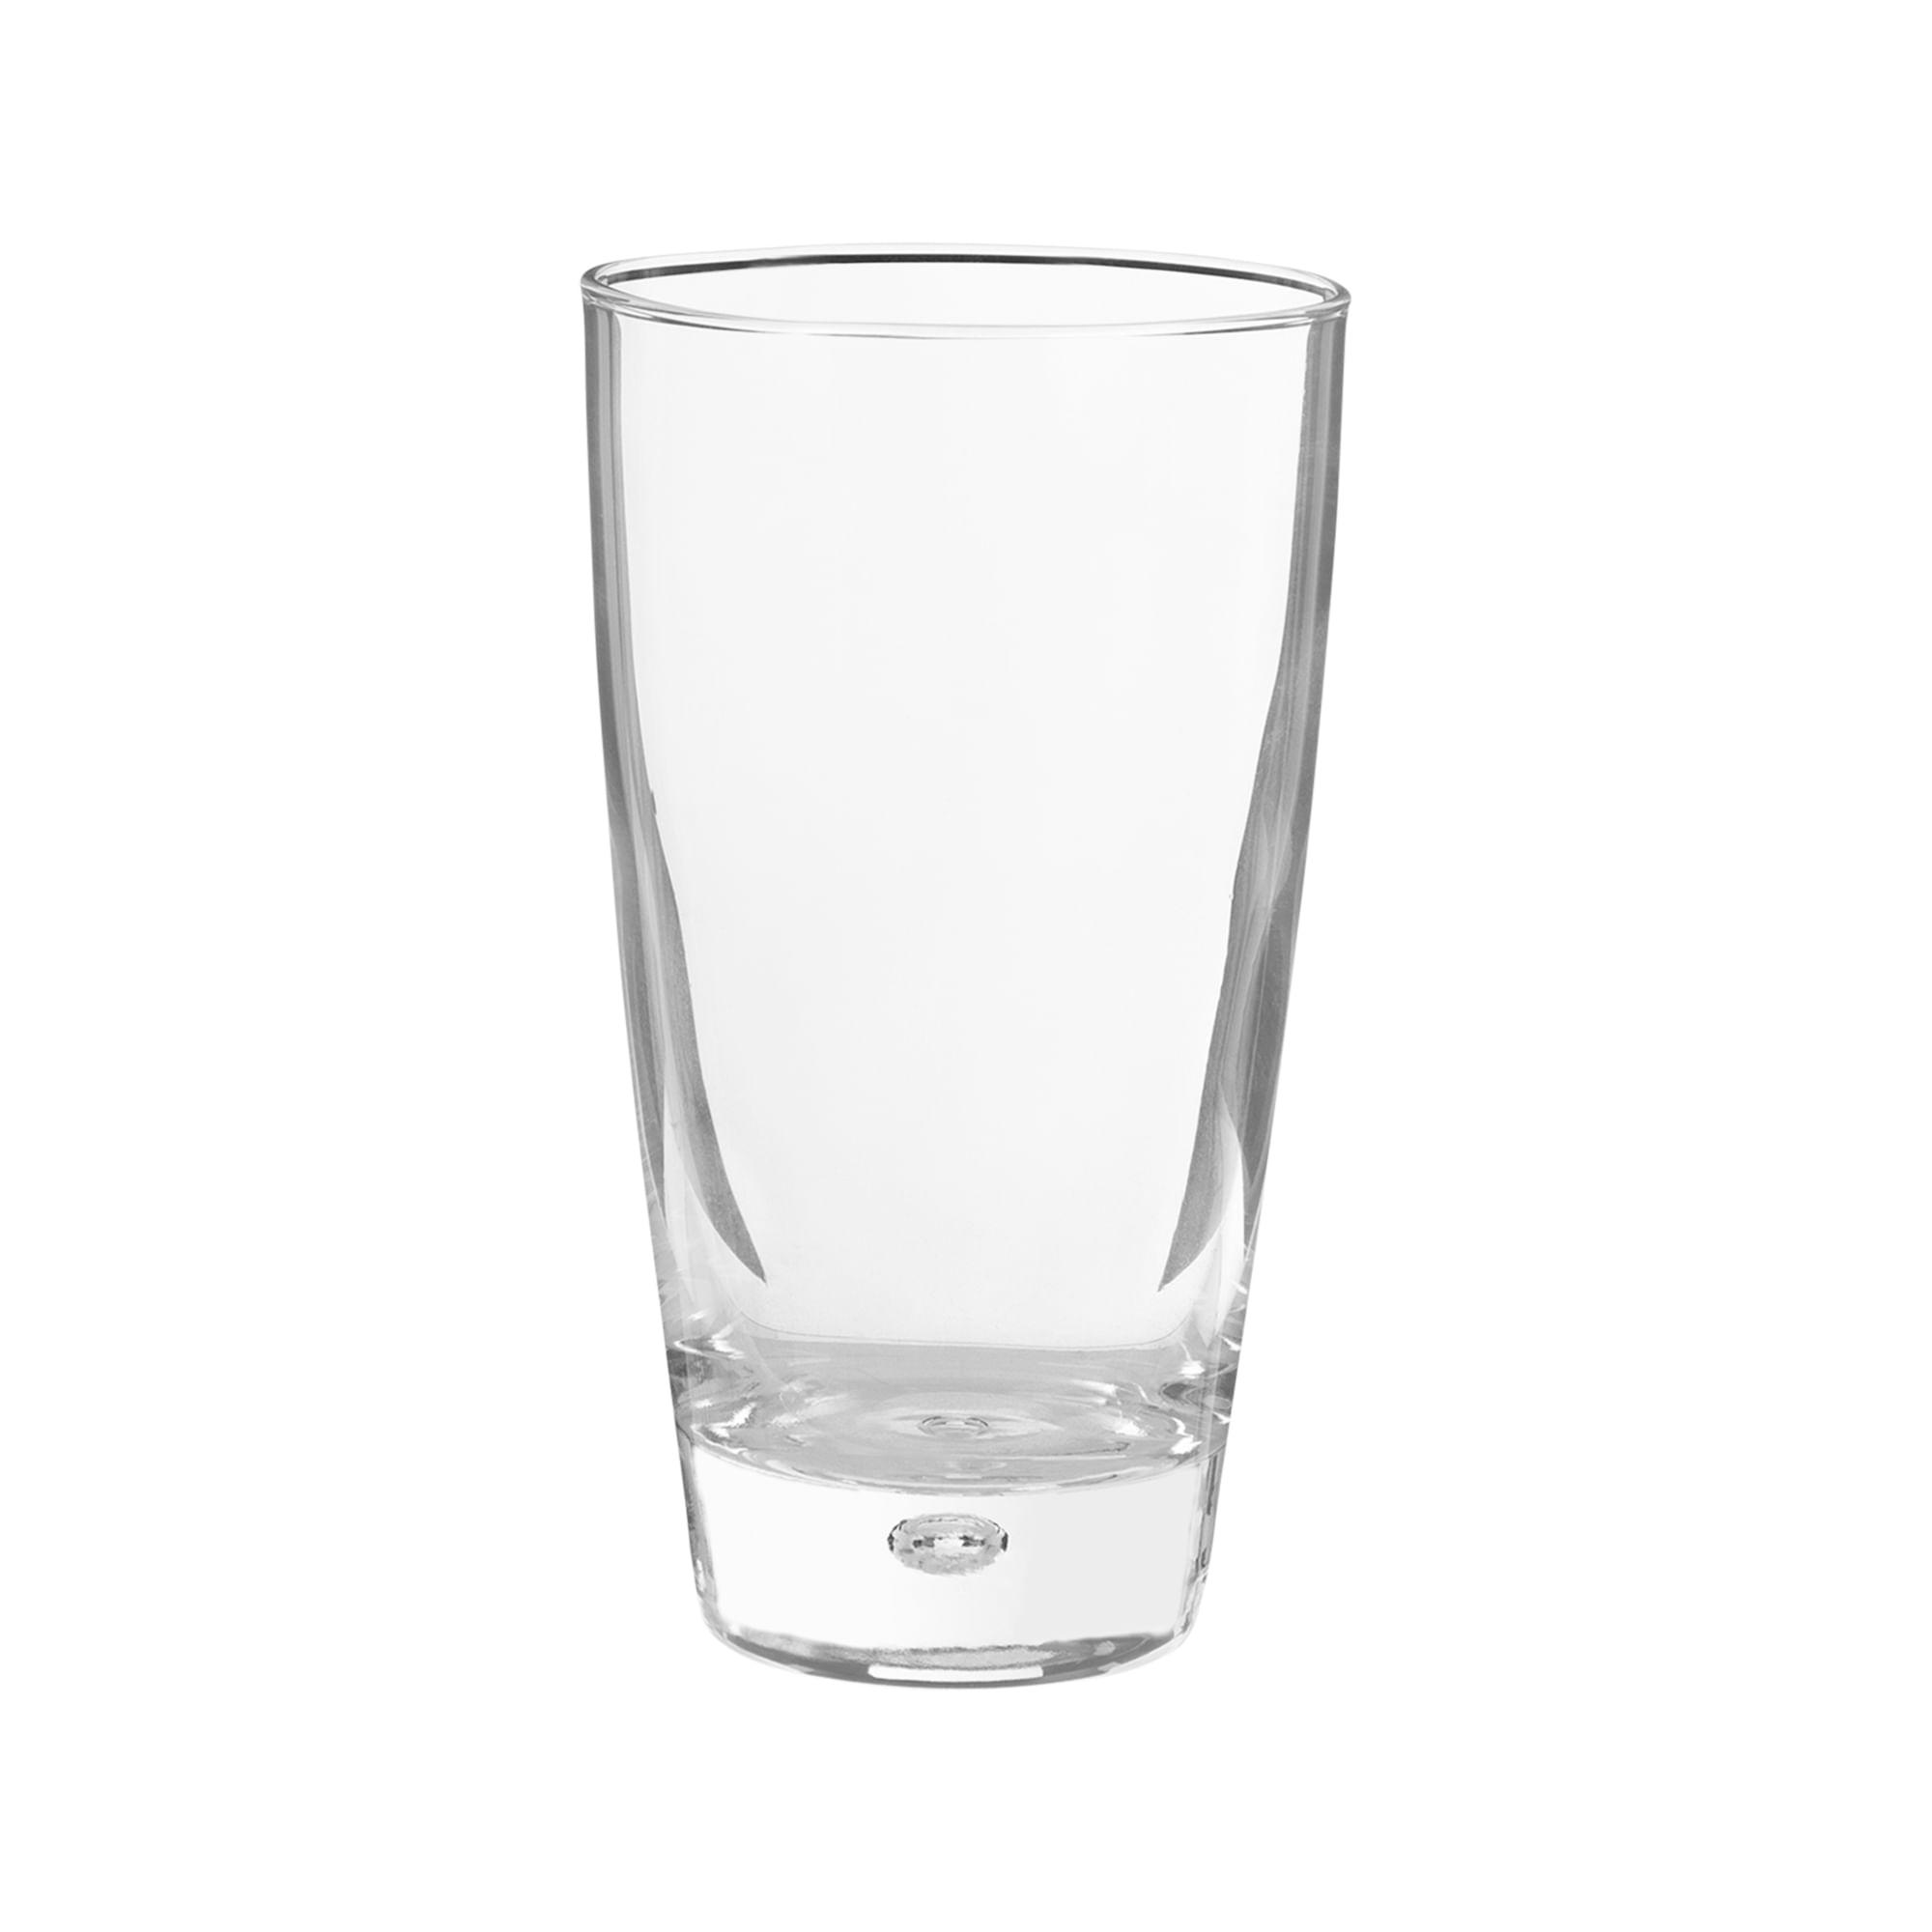 DEWS I COPO LONG DRINK 340 ML